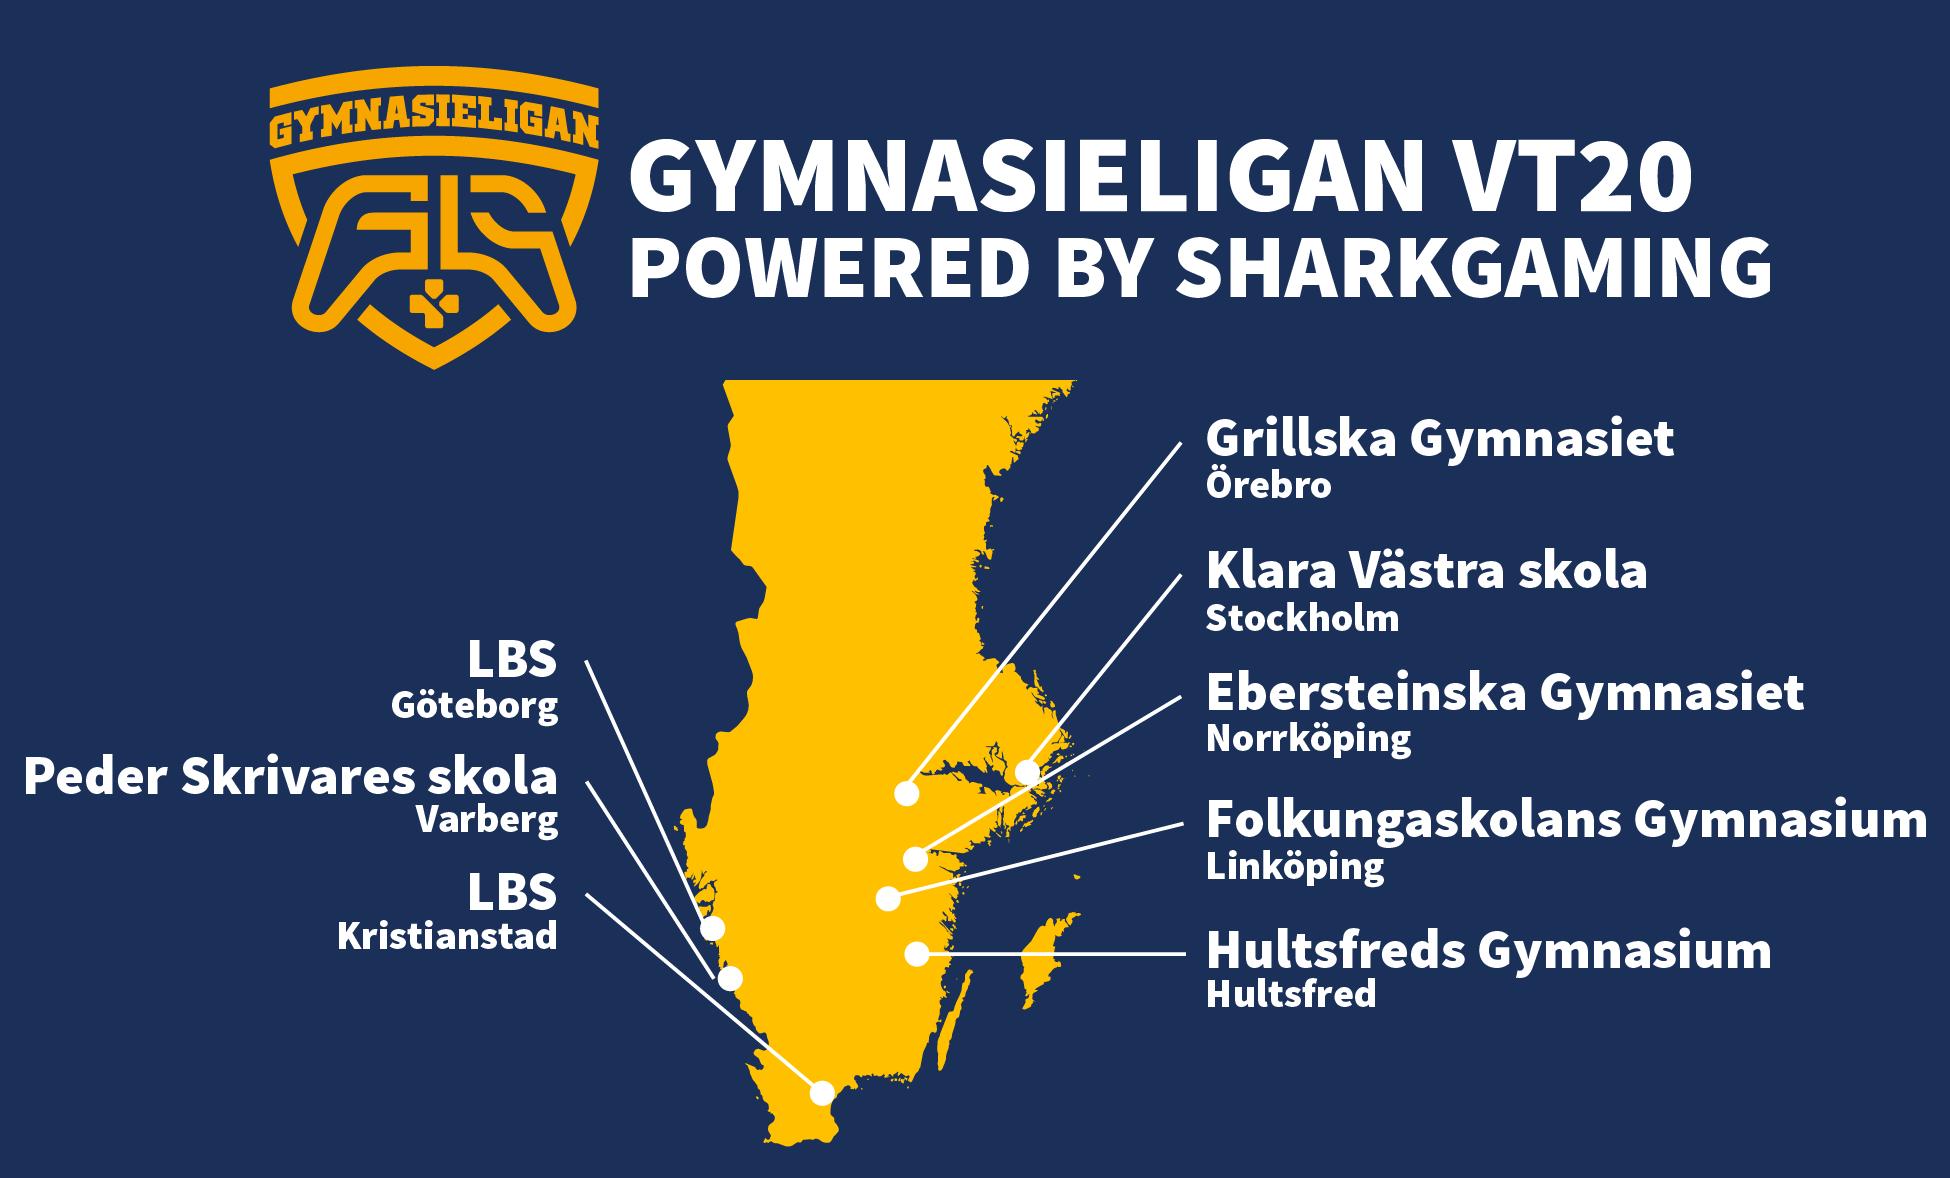 gymnasieligan vt20 LBS Göteborg